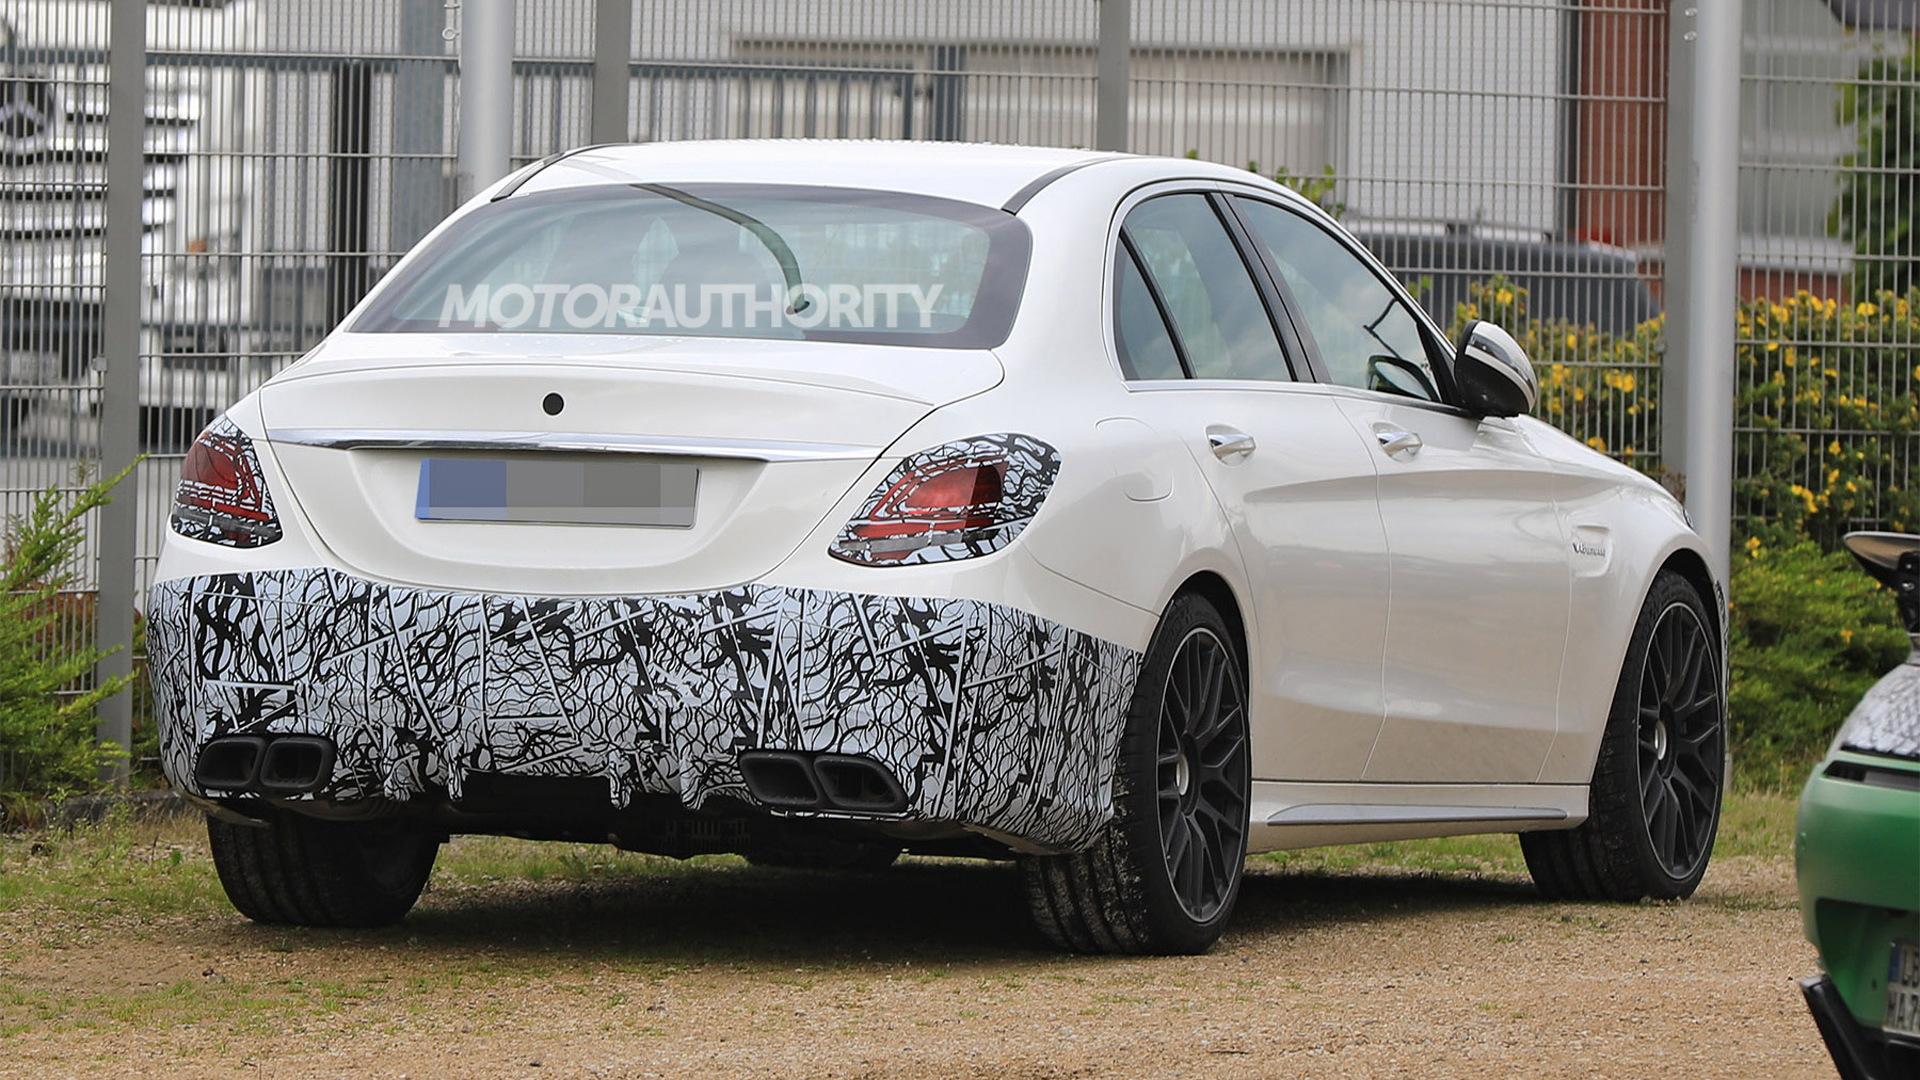 2019 Mercedes-AMG C63 facelift spy shots - Image via S. Baldauf/SB-Medien